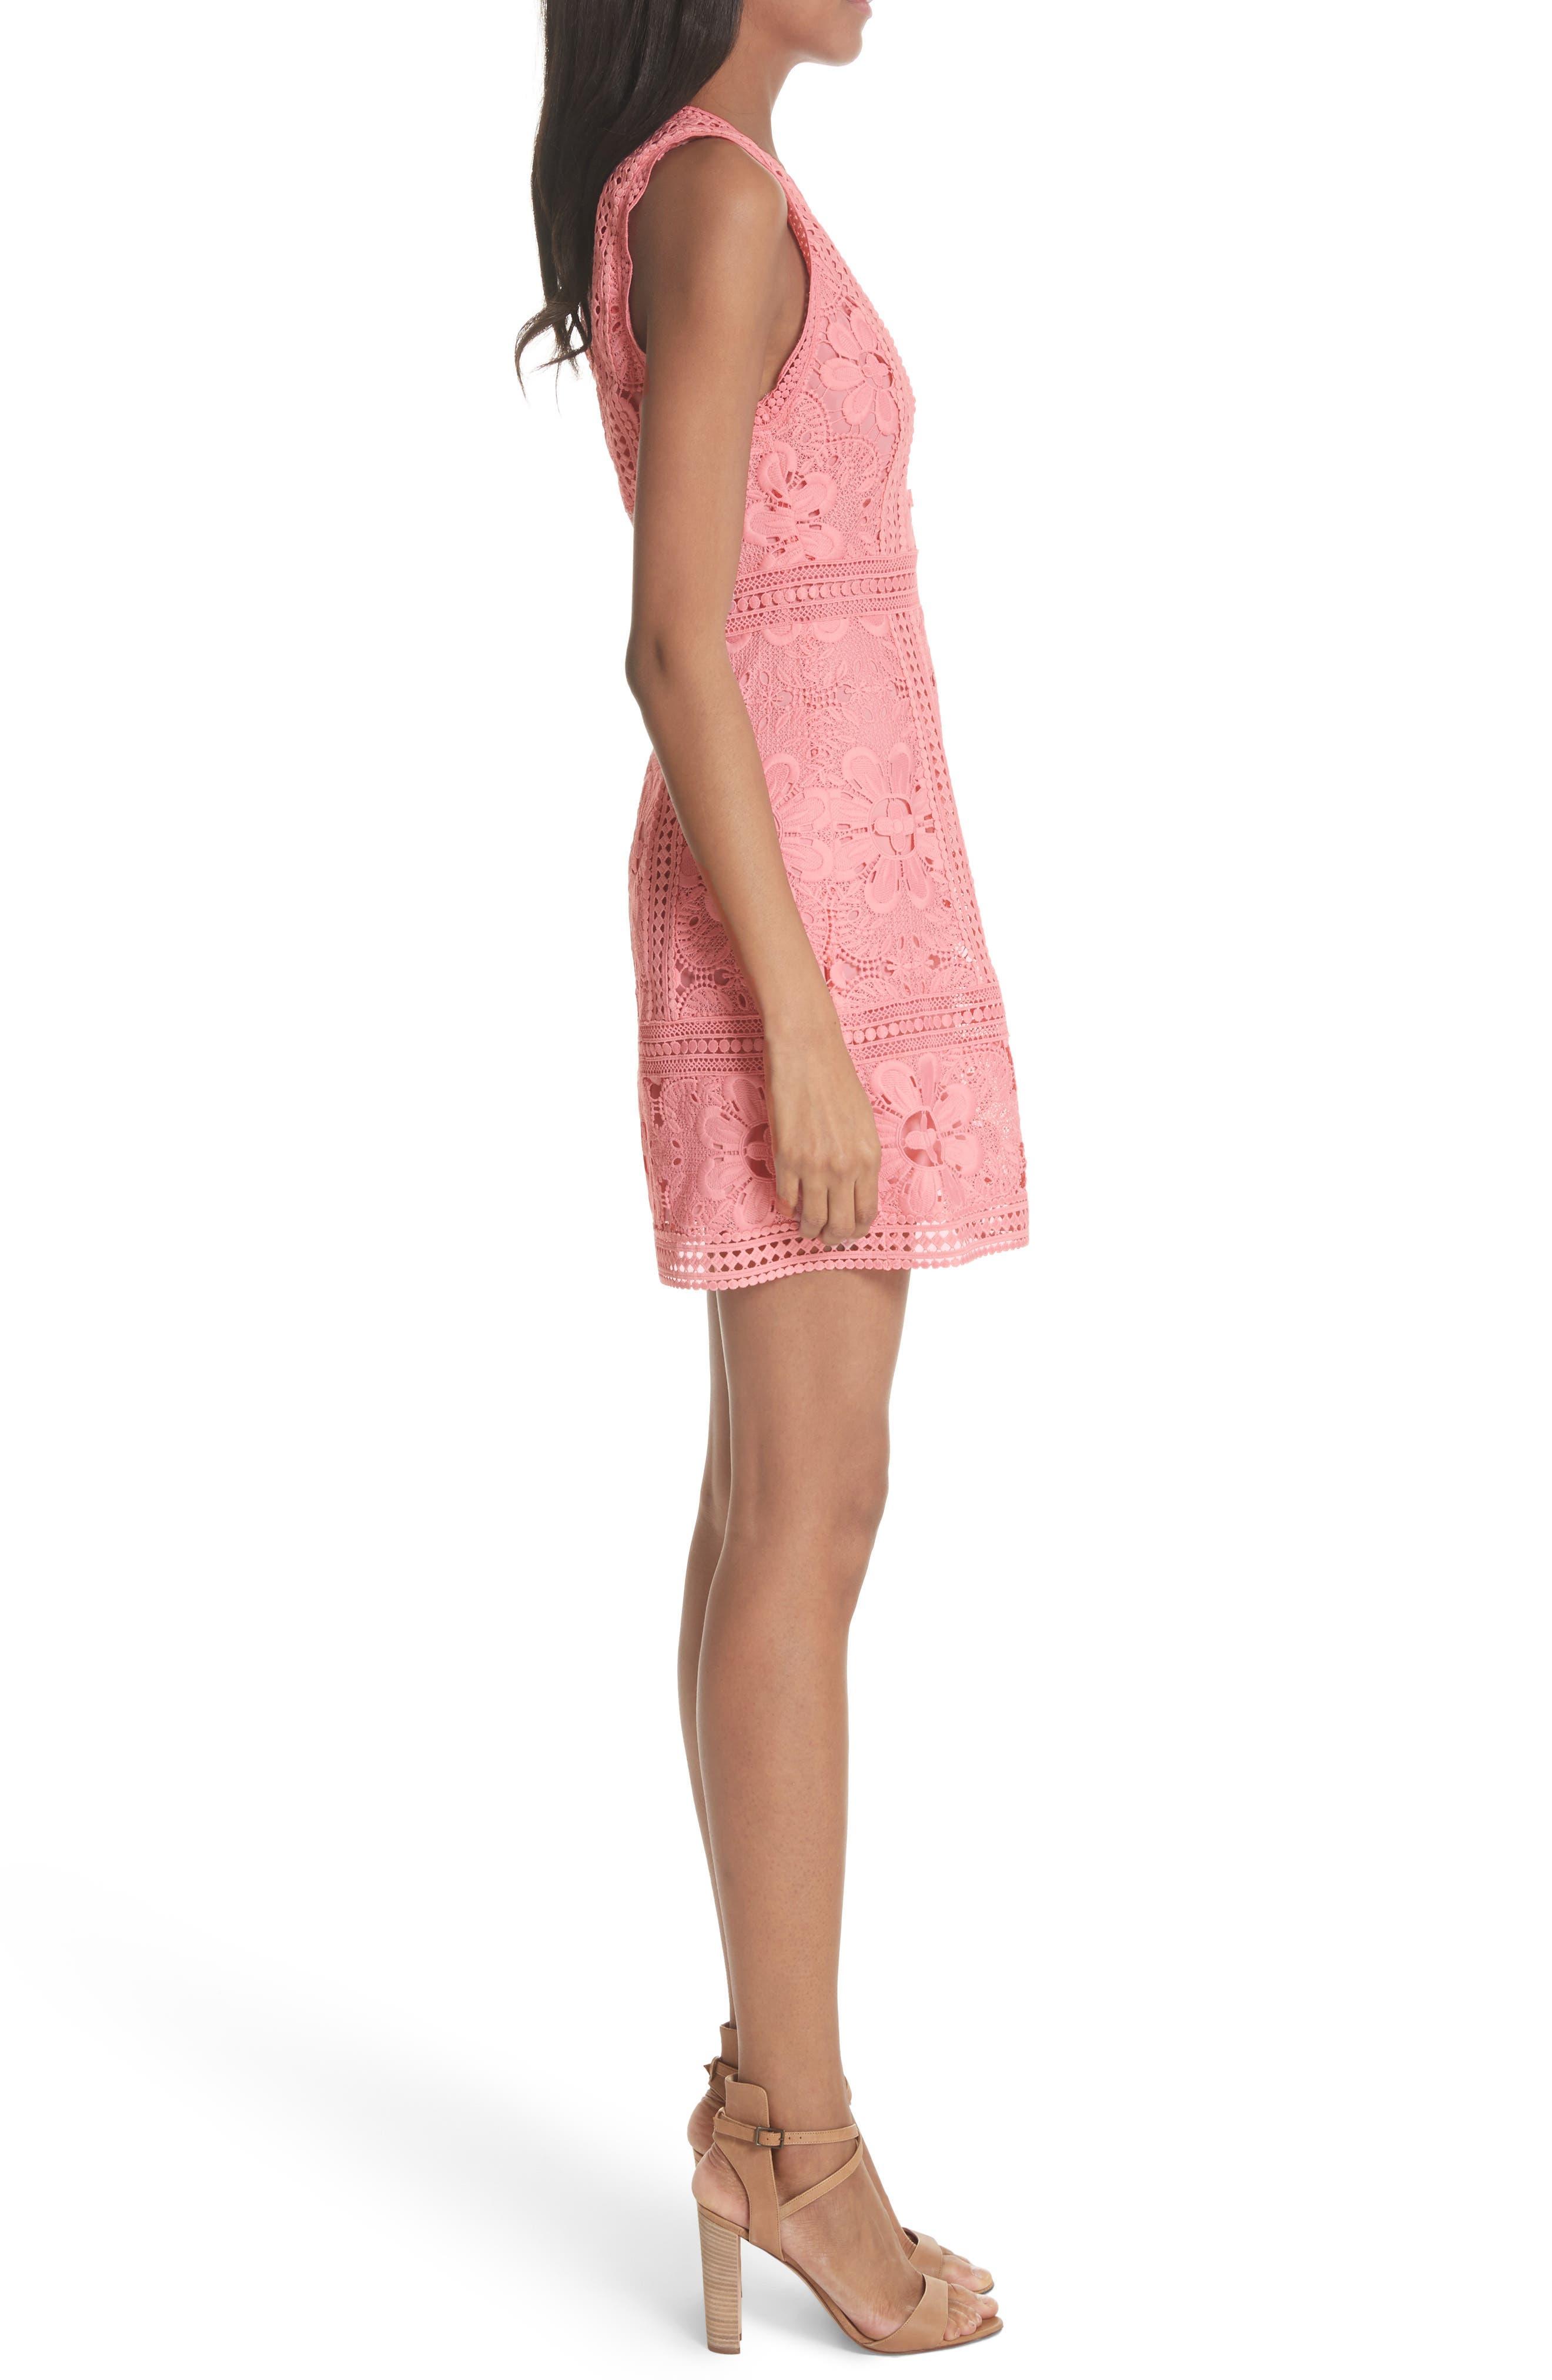 Zula Lace Minidress,                             Alternate thumbnail 3, color,                             Blossom